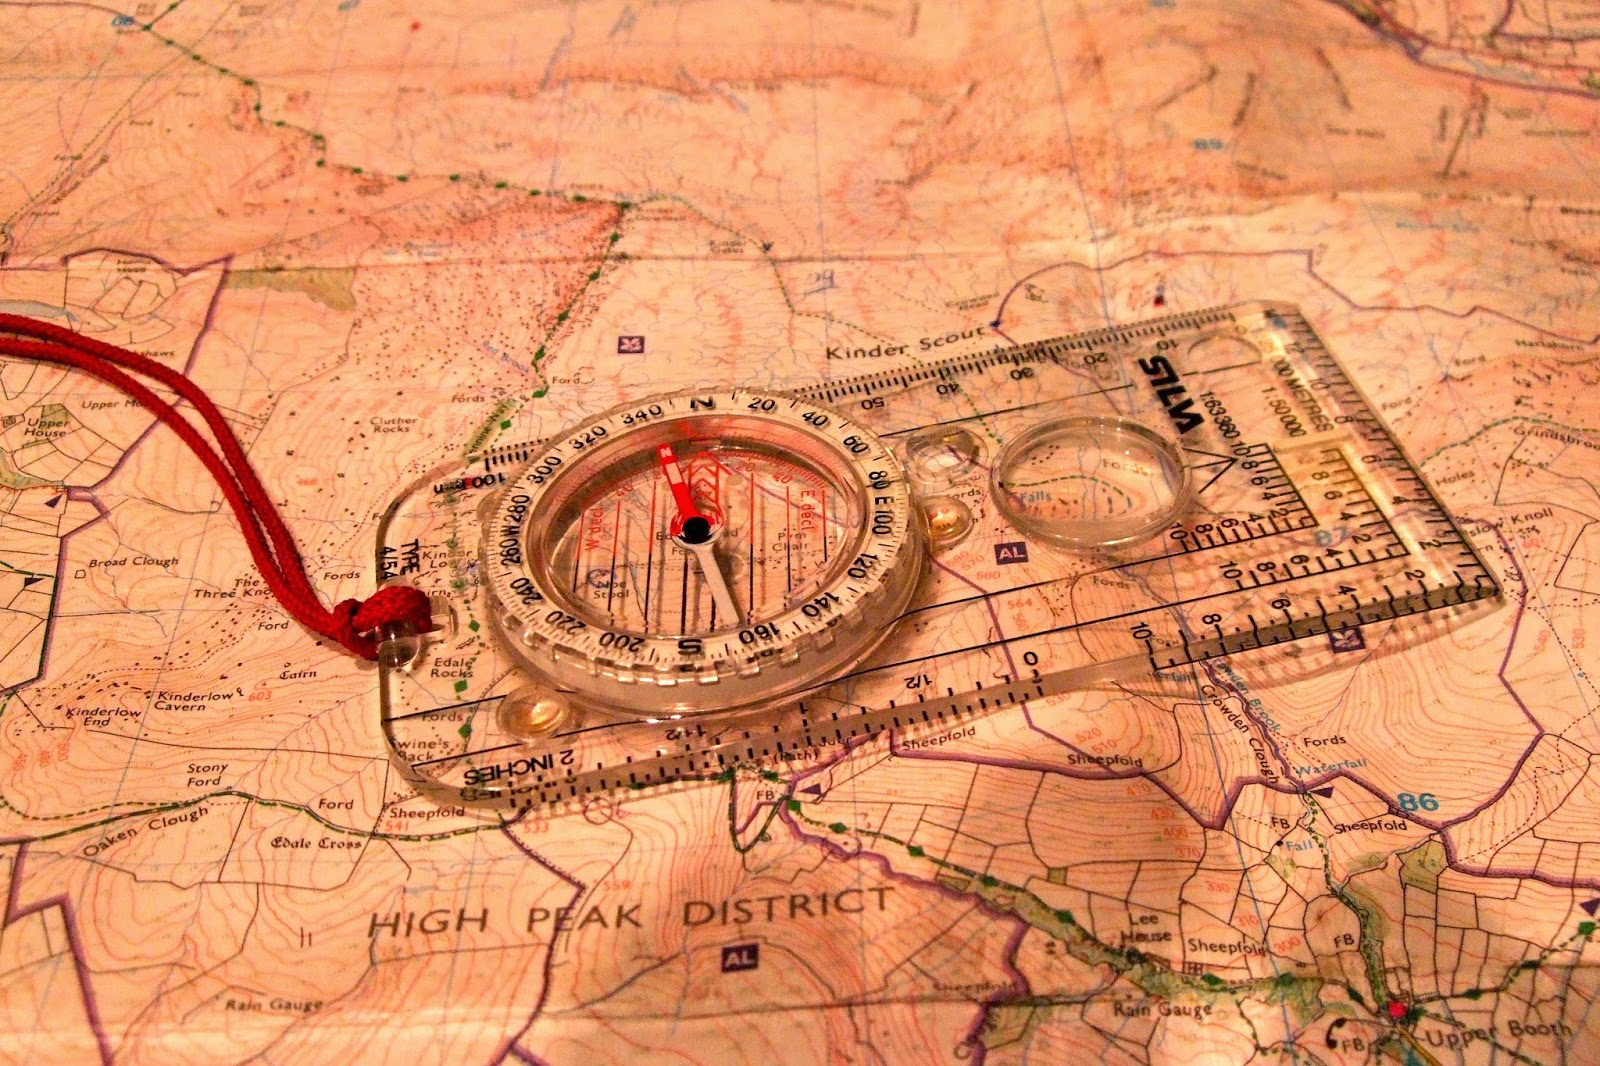 Adirondack Backcountry Navigation Classes - GPS, Map & Compass